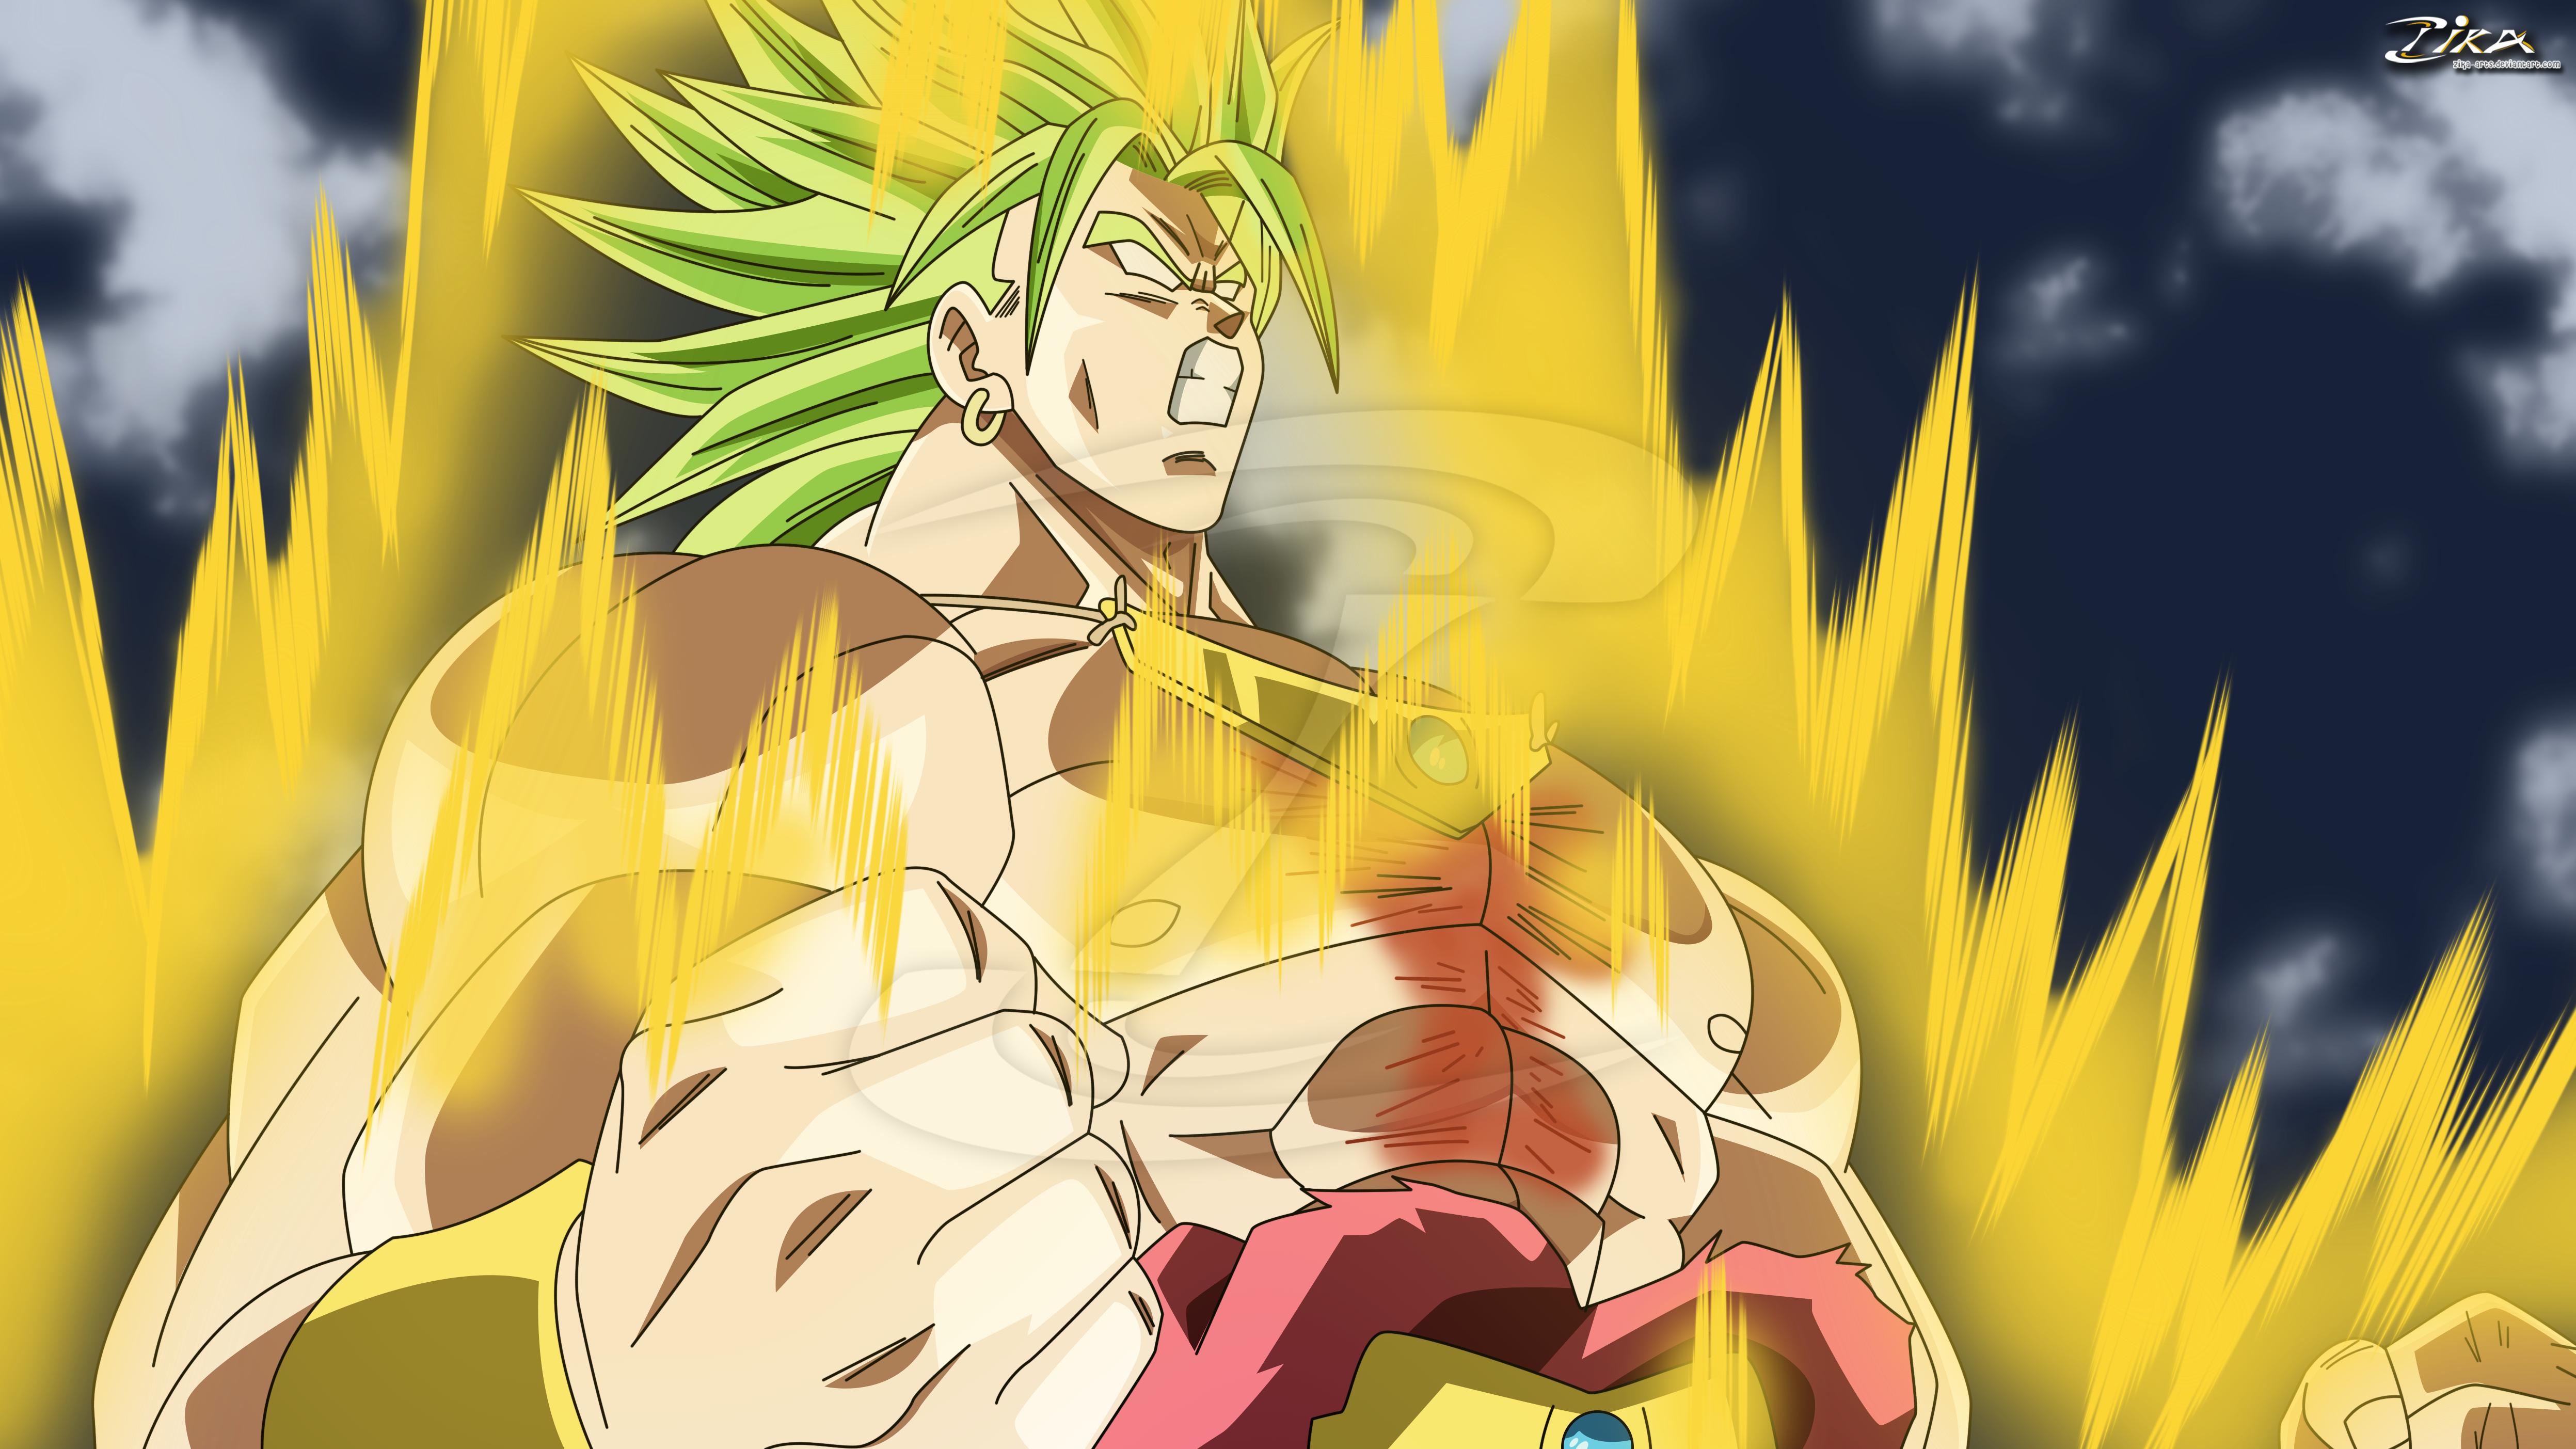 Broly the Legendary Super saiyan by zika-arts on DeviantArt